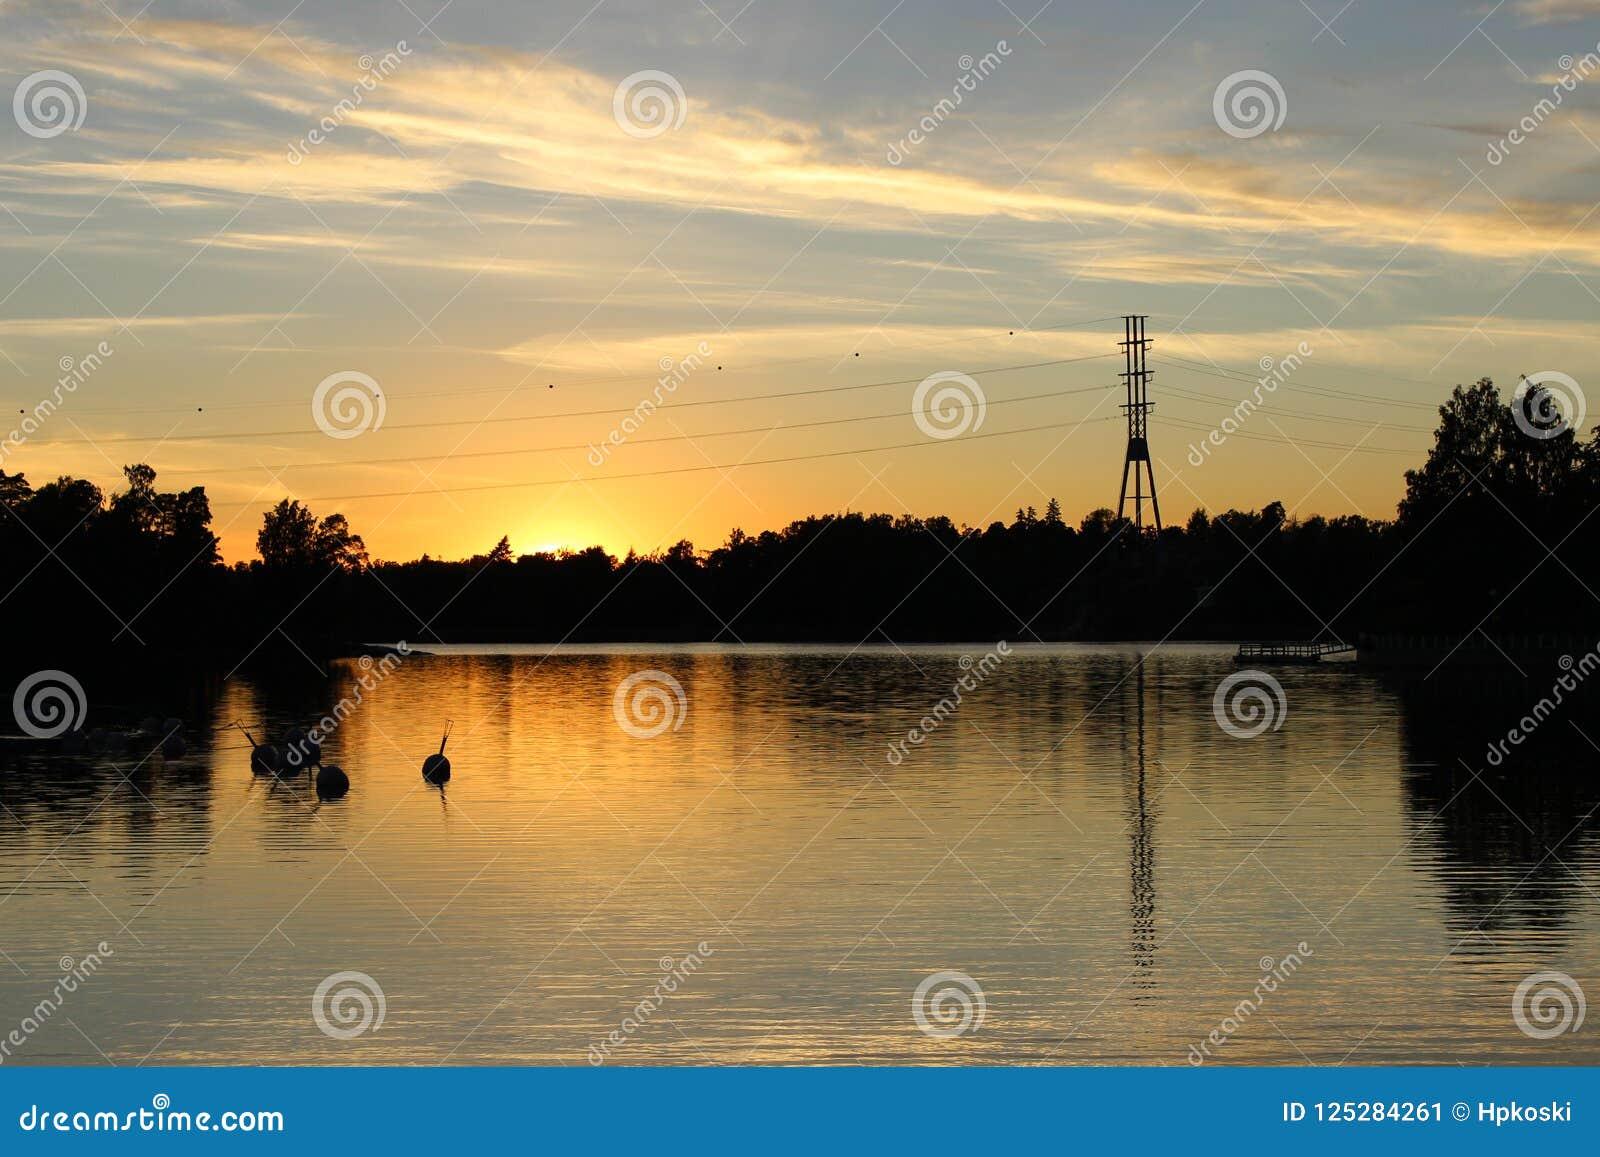 ebebe69a931 Beautiful and scenic sunset view of Humallahti in Töölö